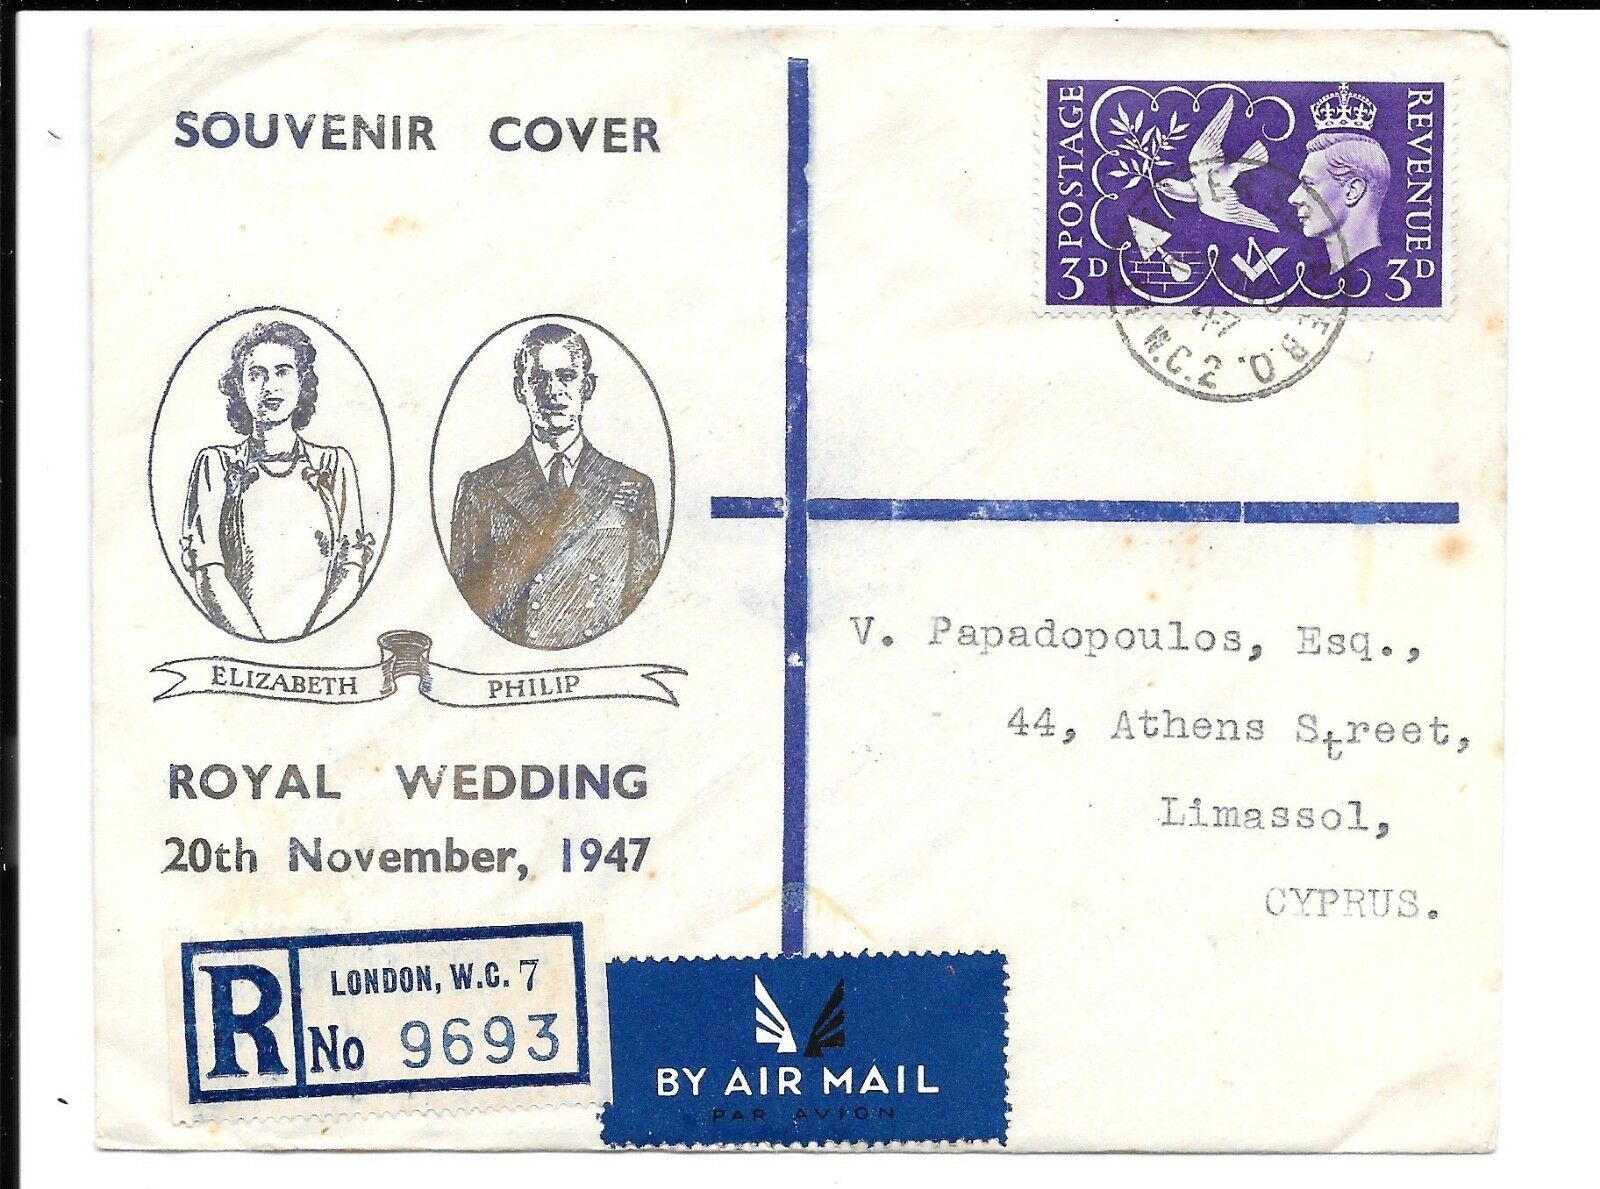 GB ROYAL WEDDING COVER 20.11.47